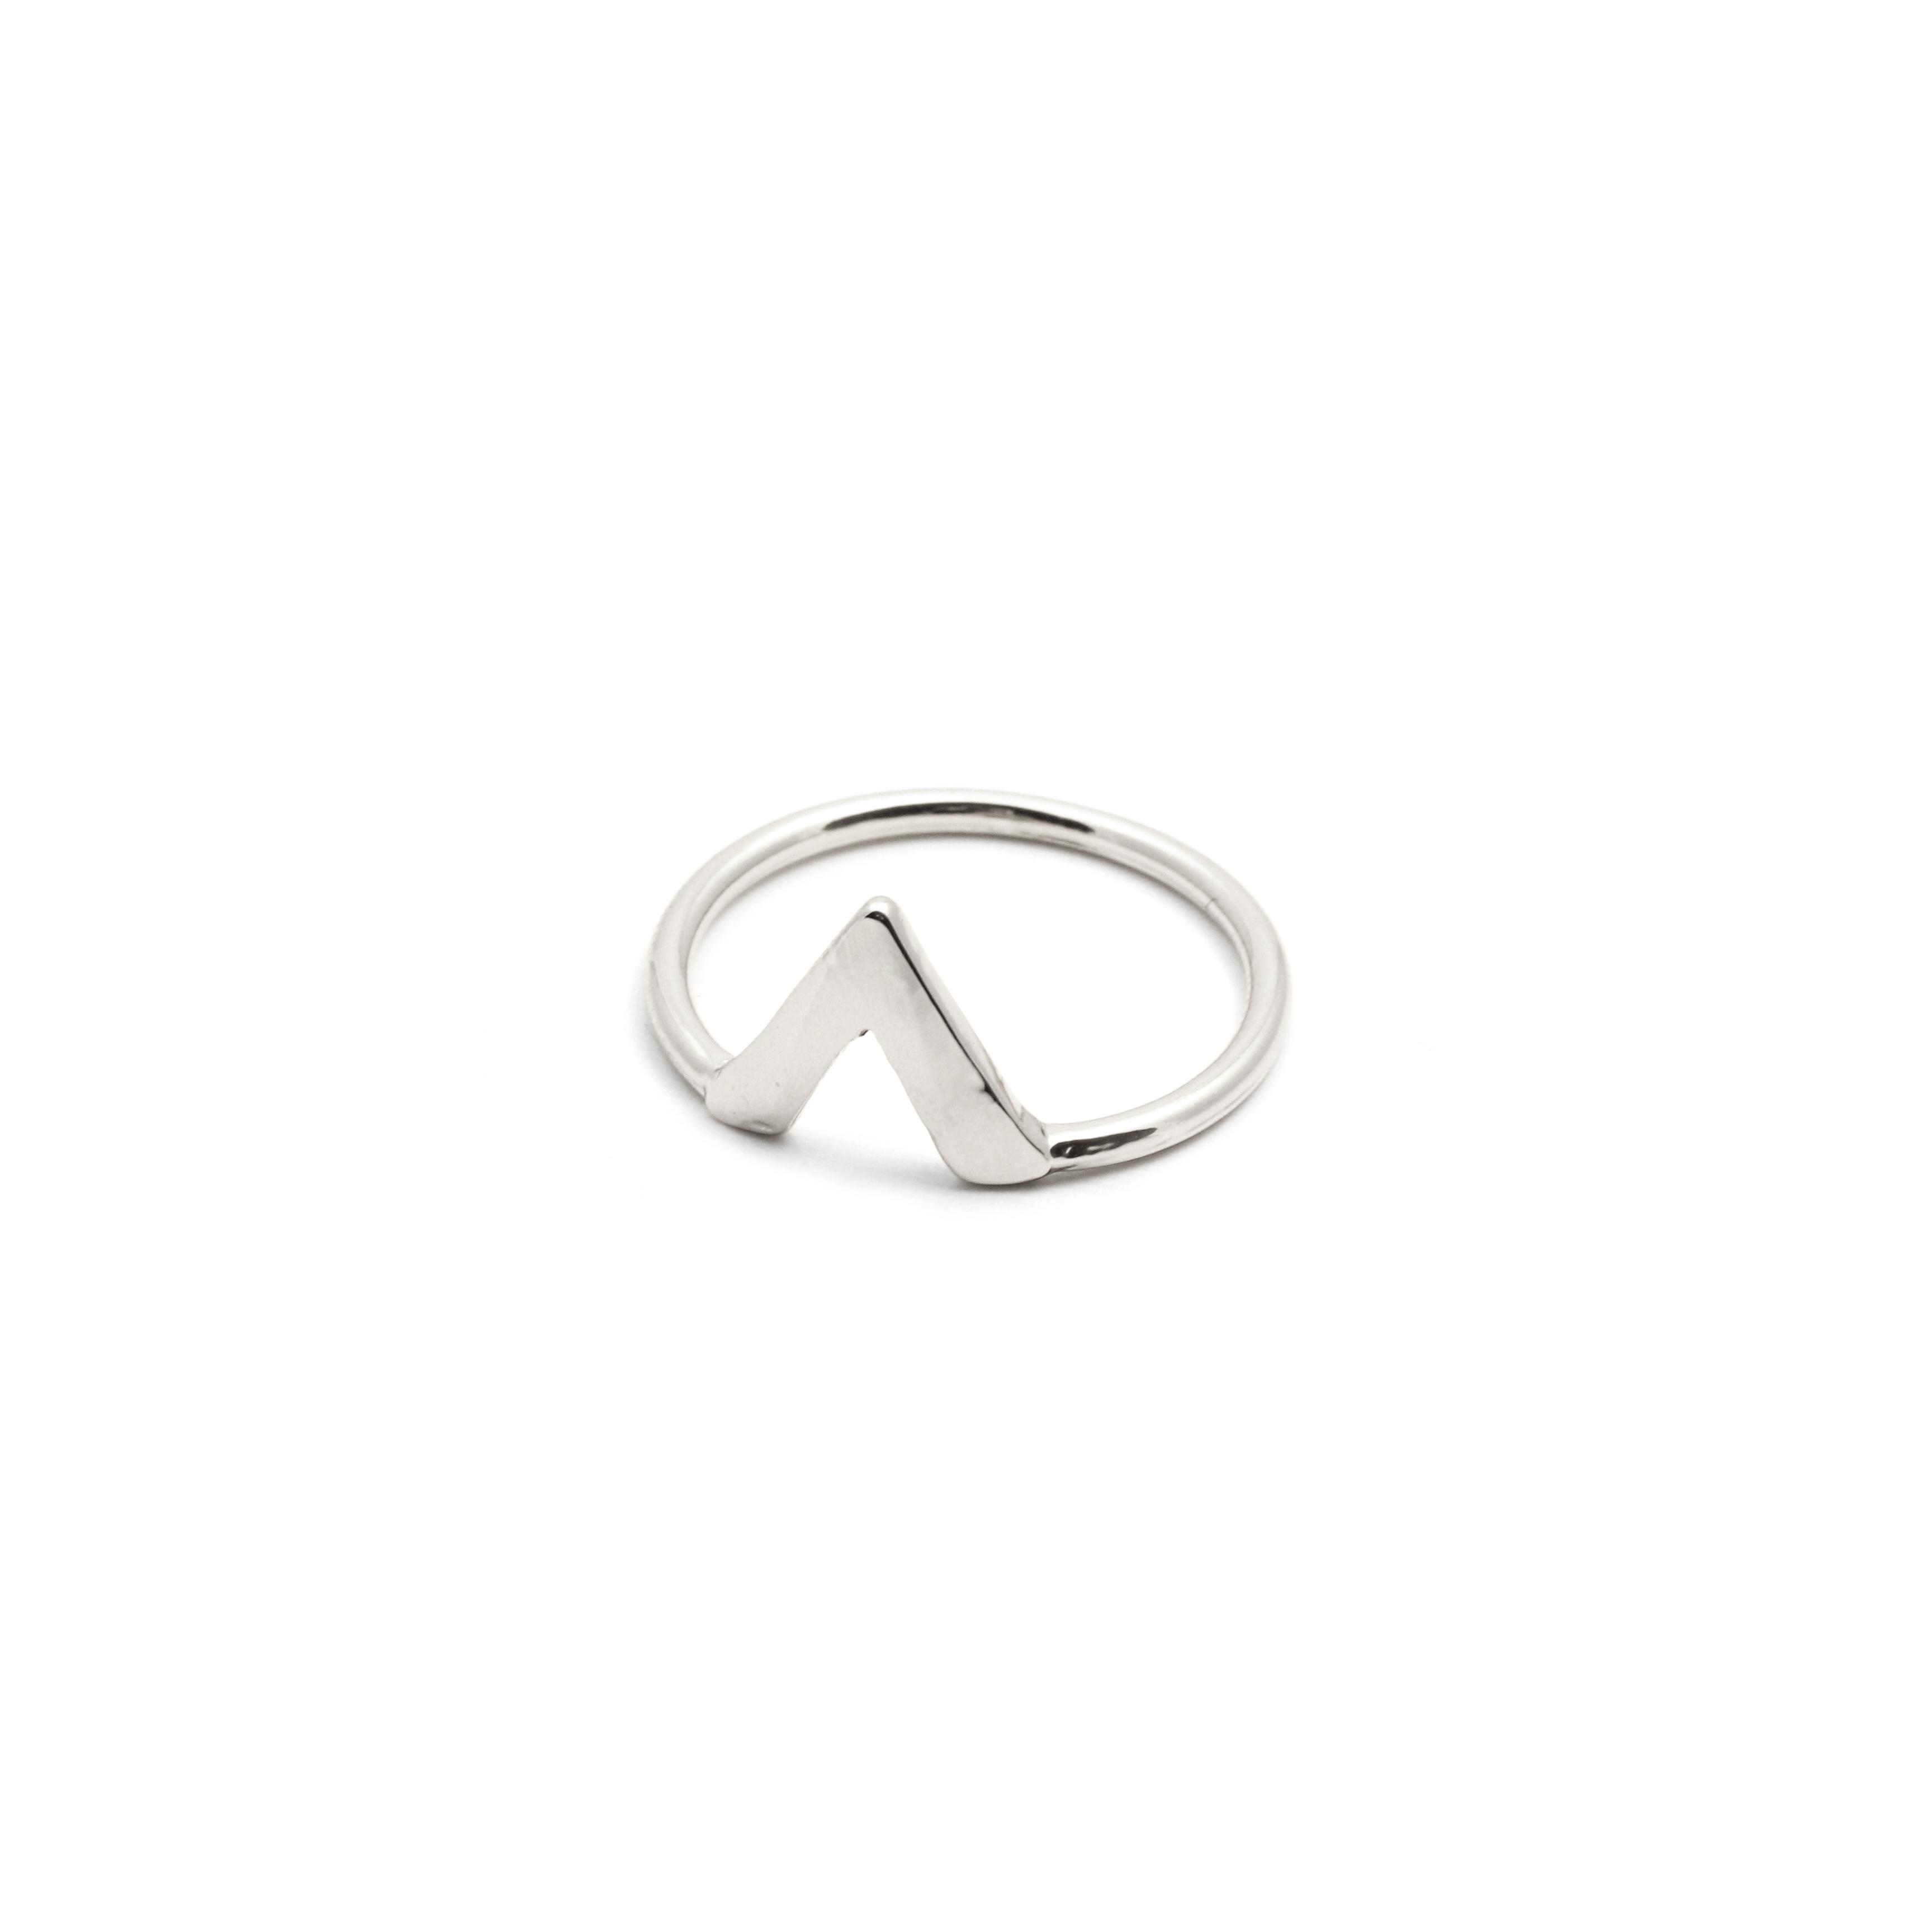 Ring geometrisch Silber triangle MADELEINE ISSING